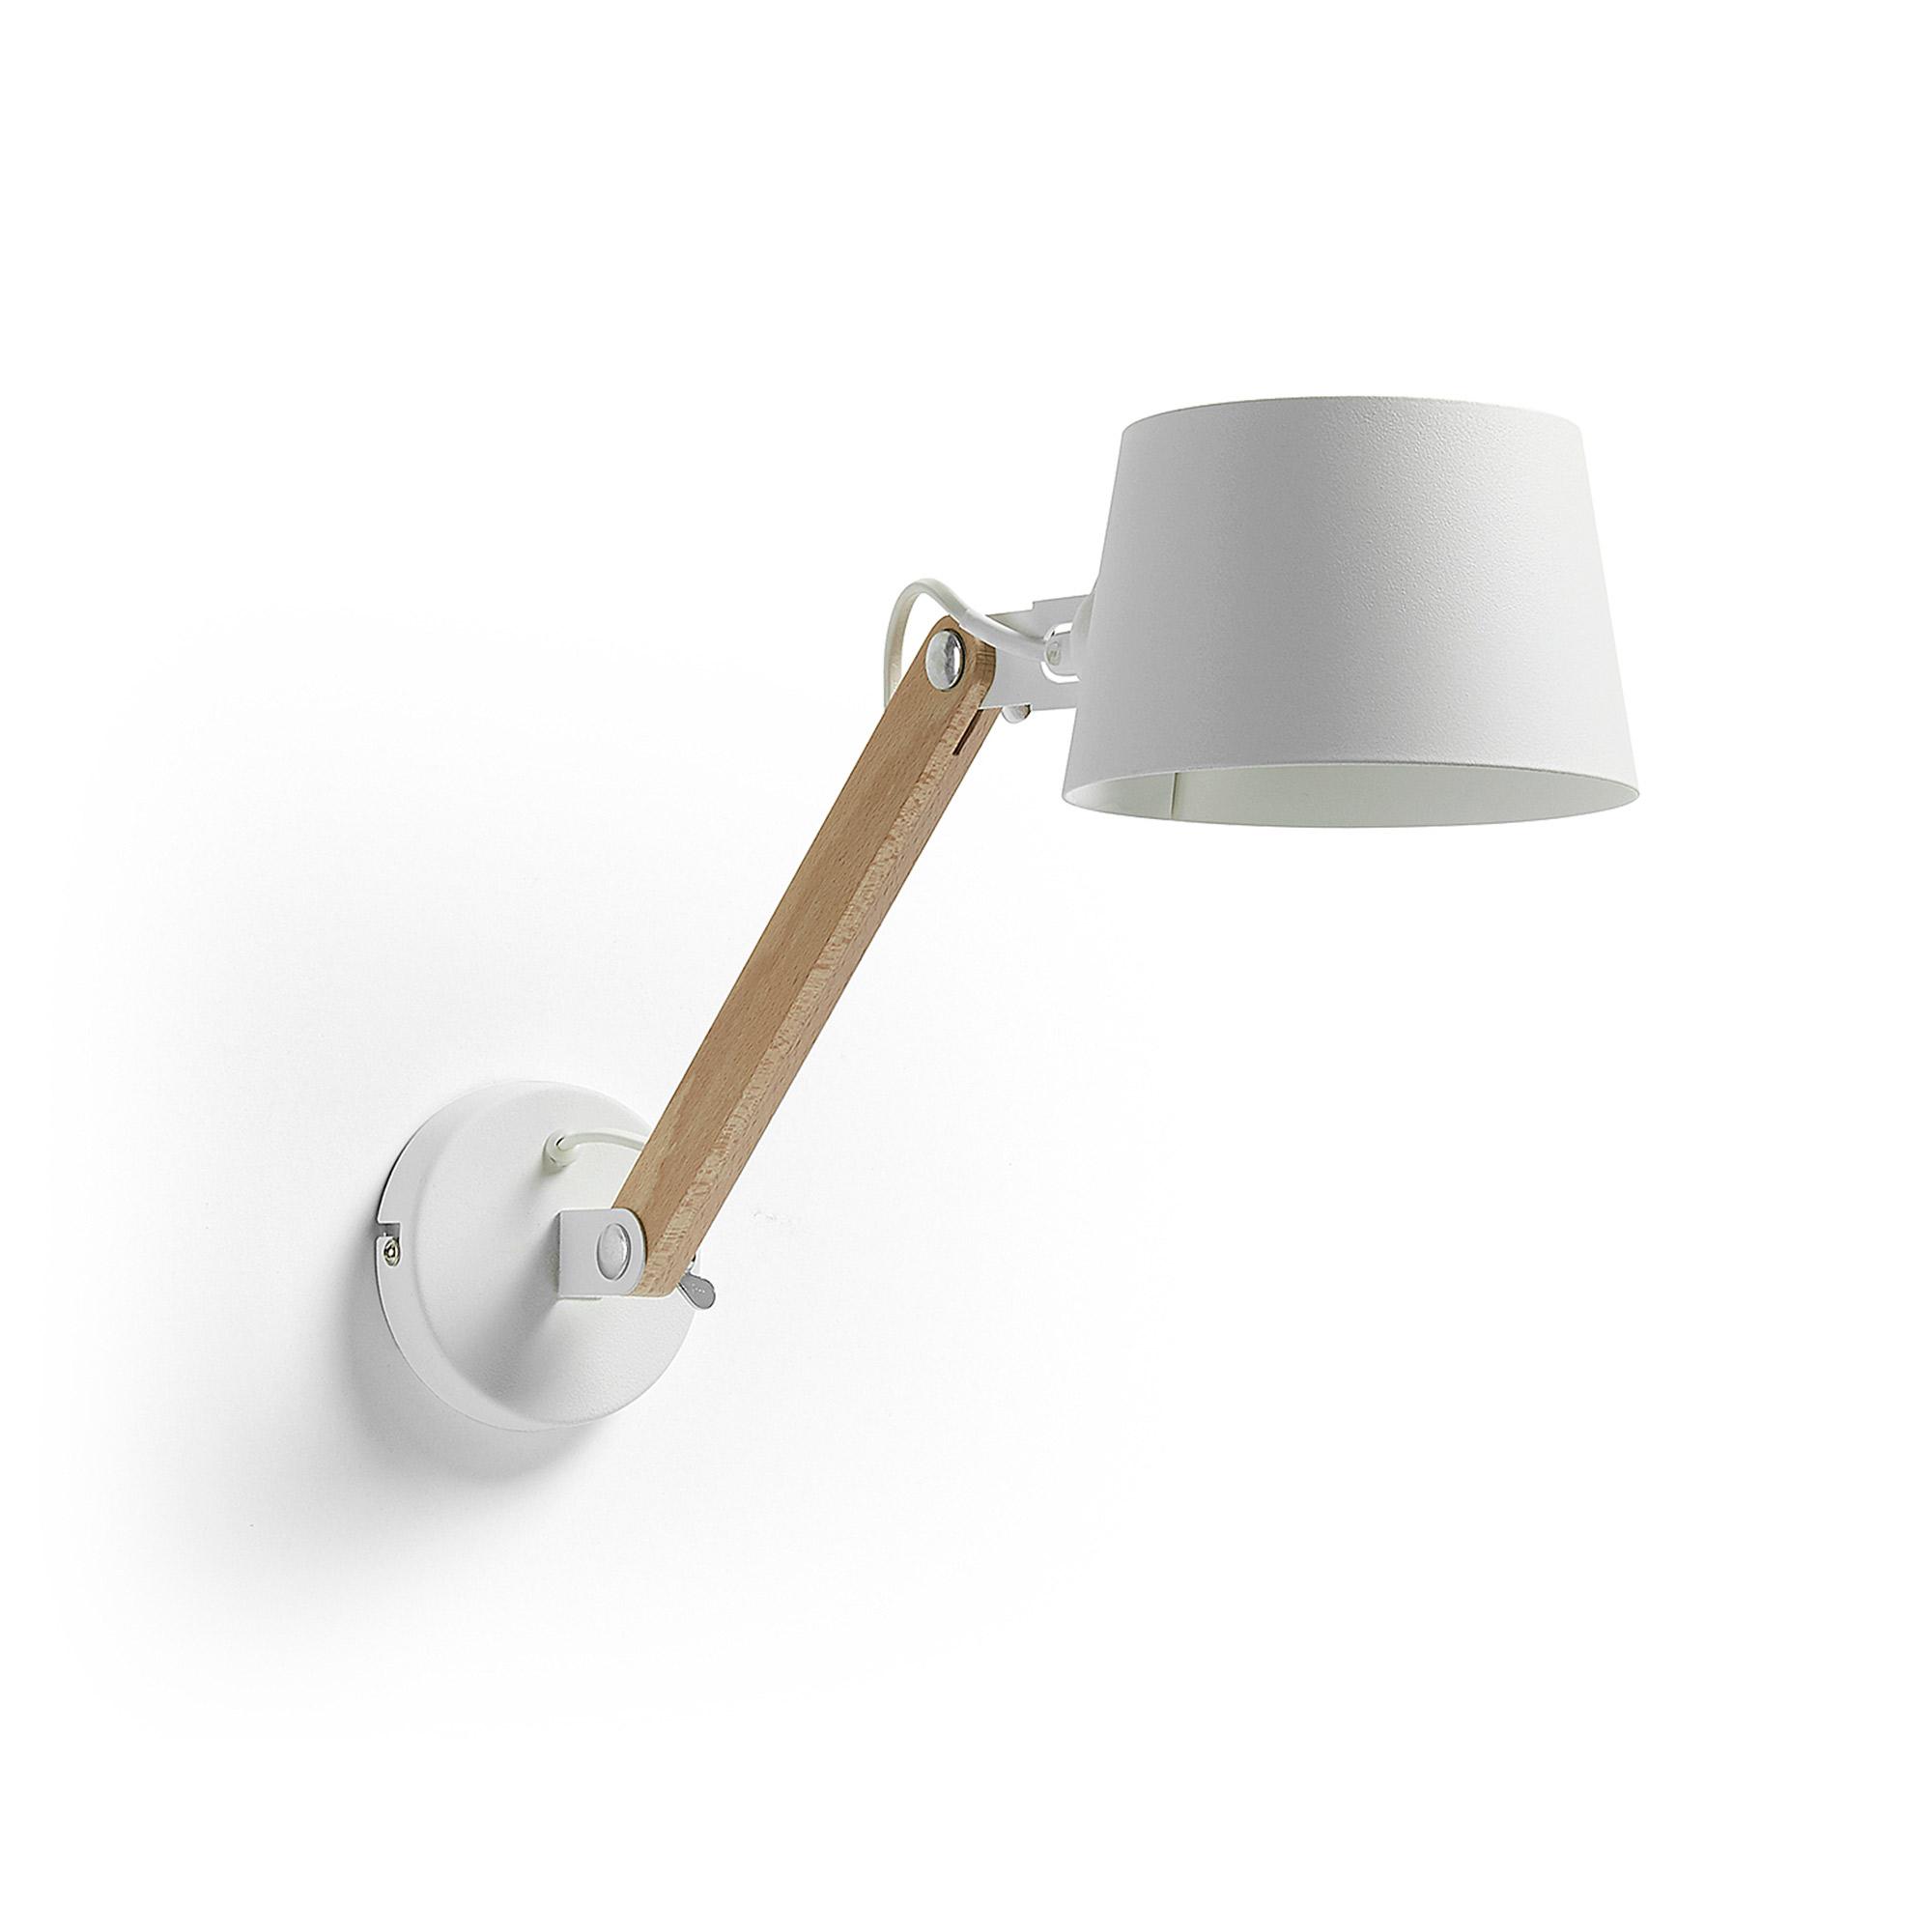 Kave Home Wandlamp 'Muse', kleur Wit